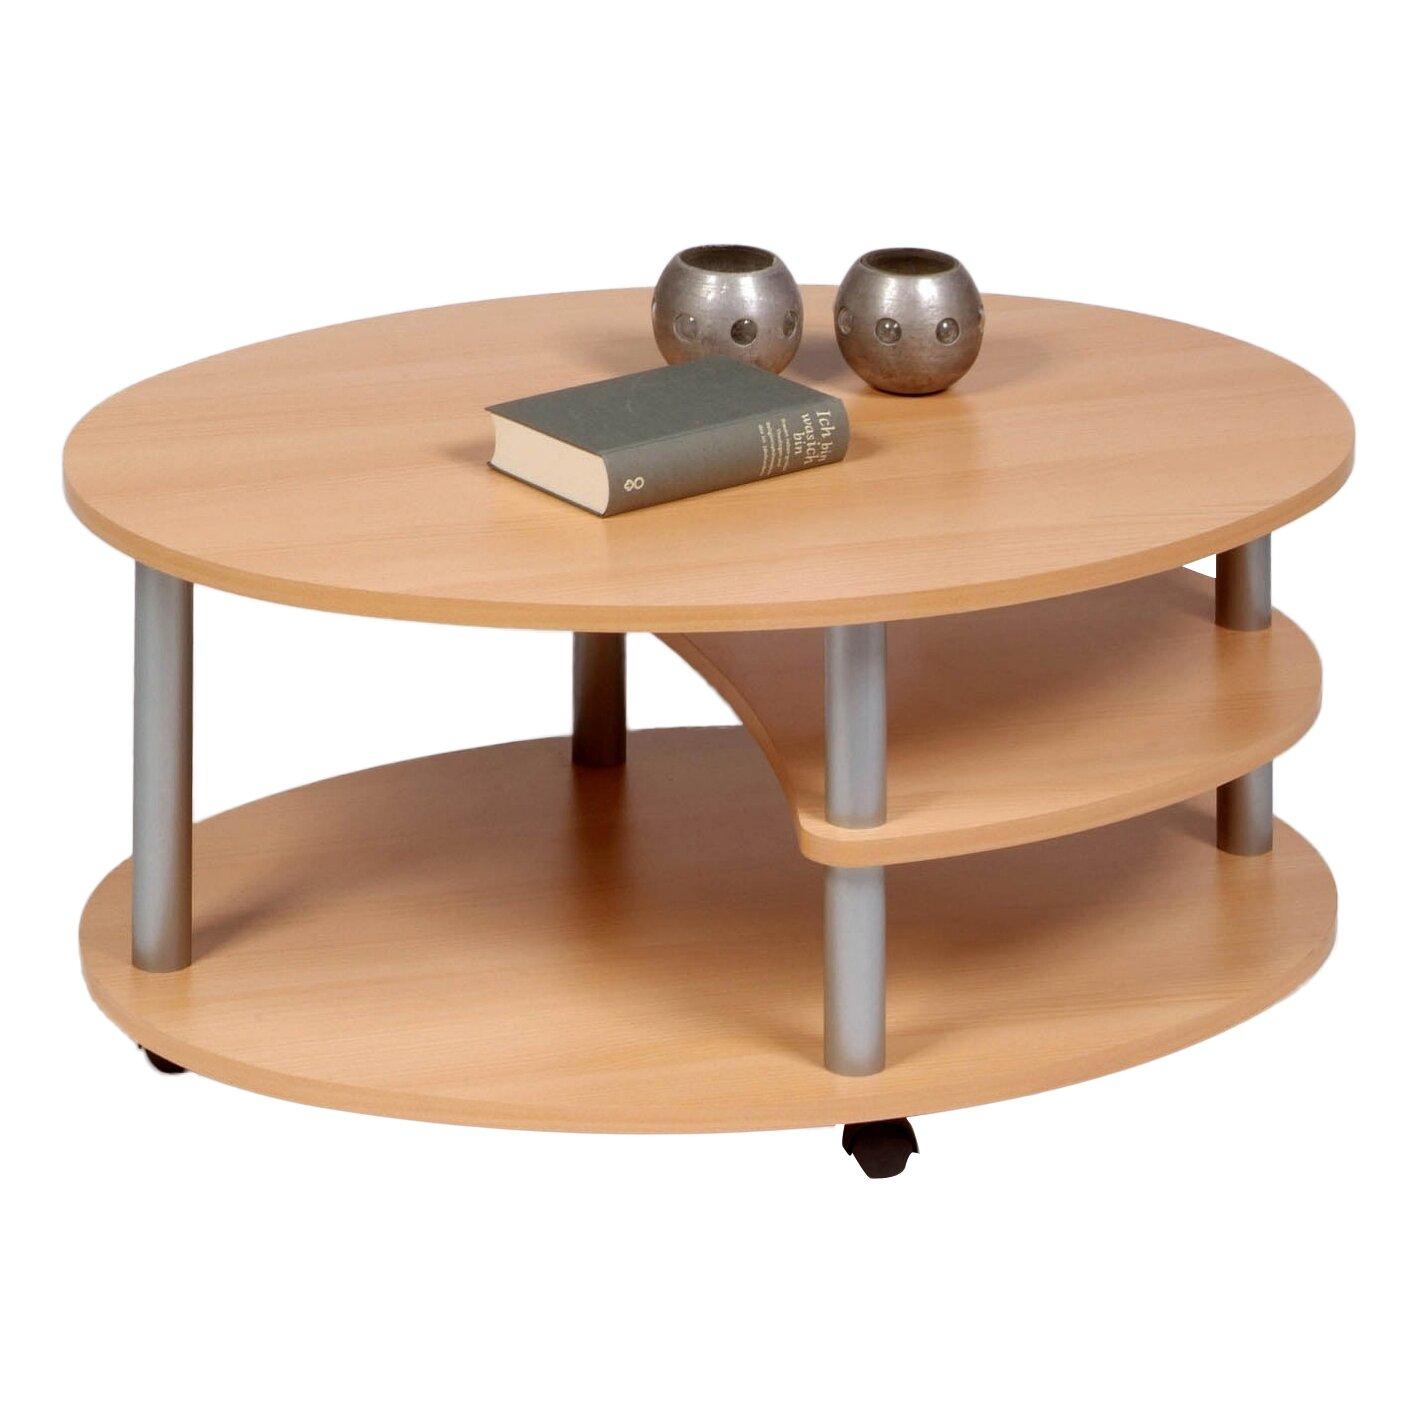 Wayfair Glass Coffee Table Uk: Alfa-Tische Primo Coffee Table & Reviews